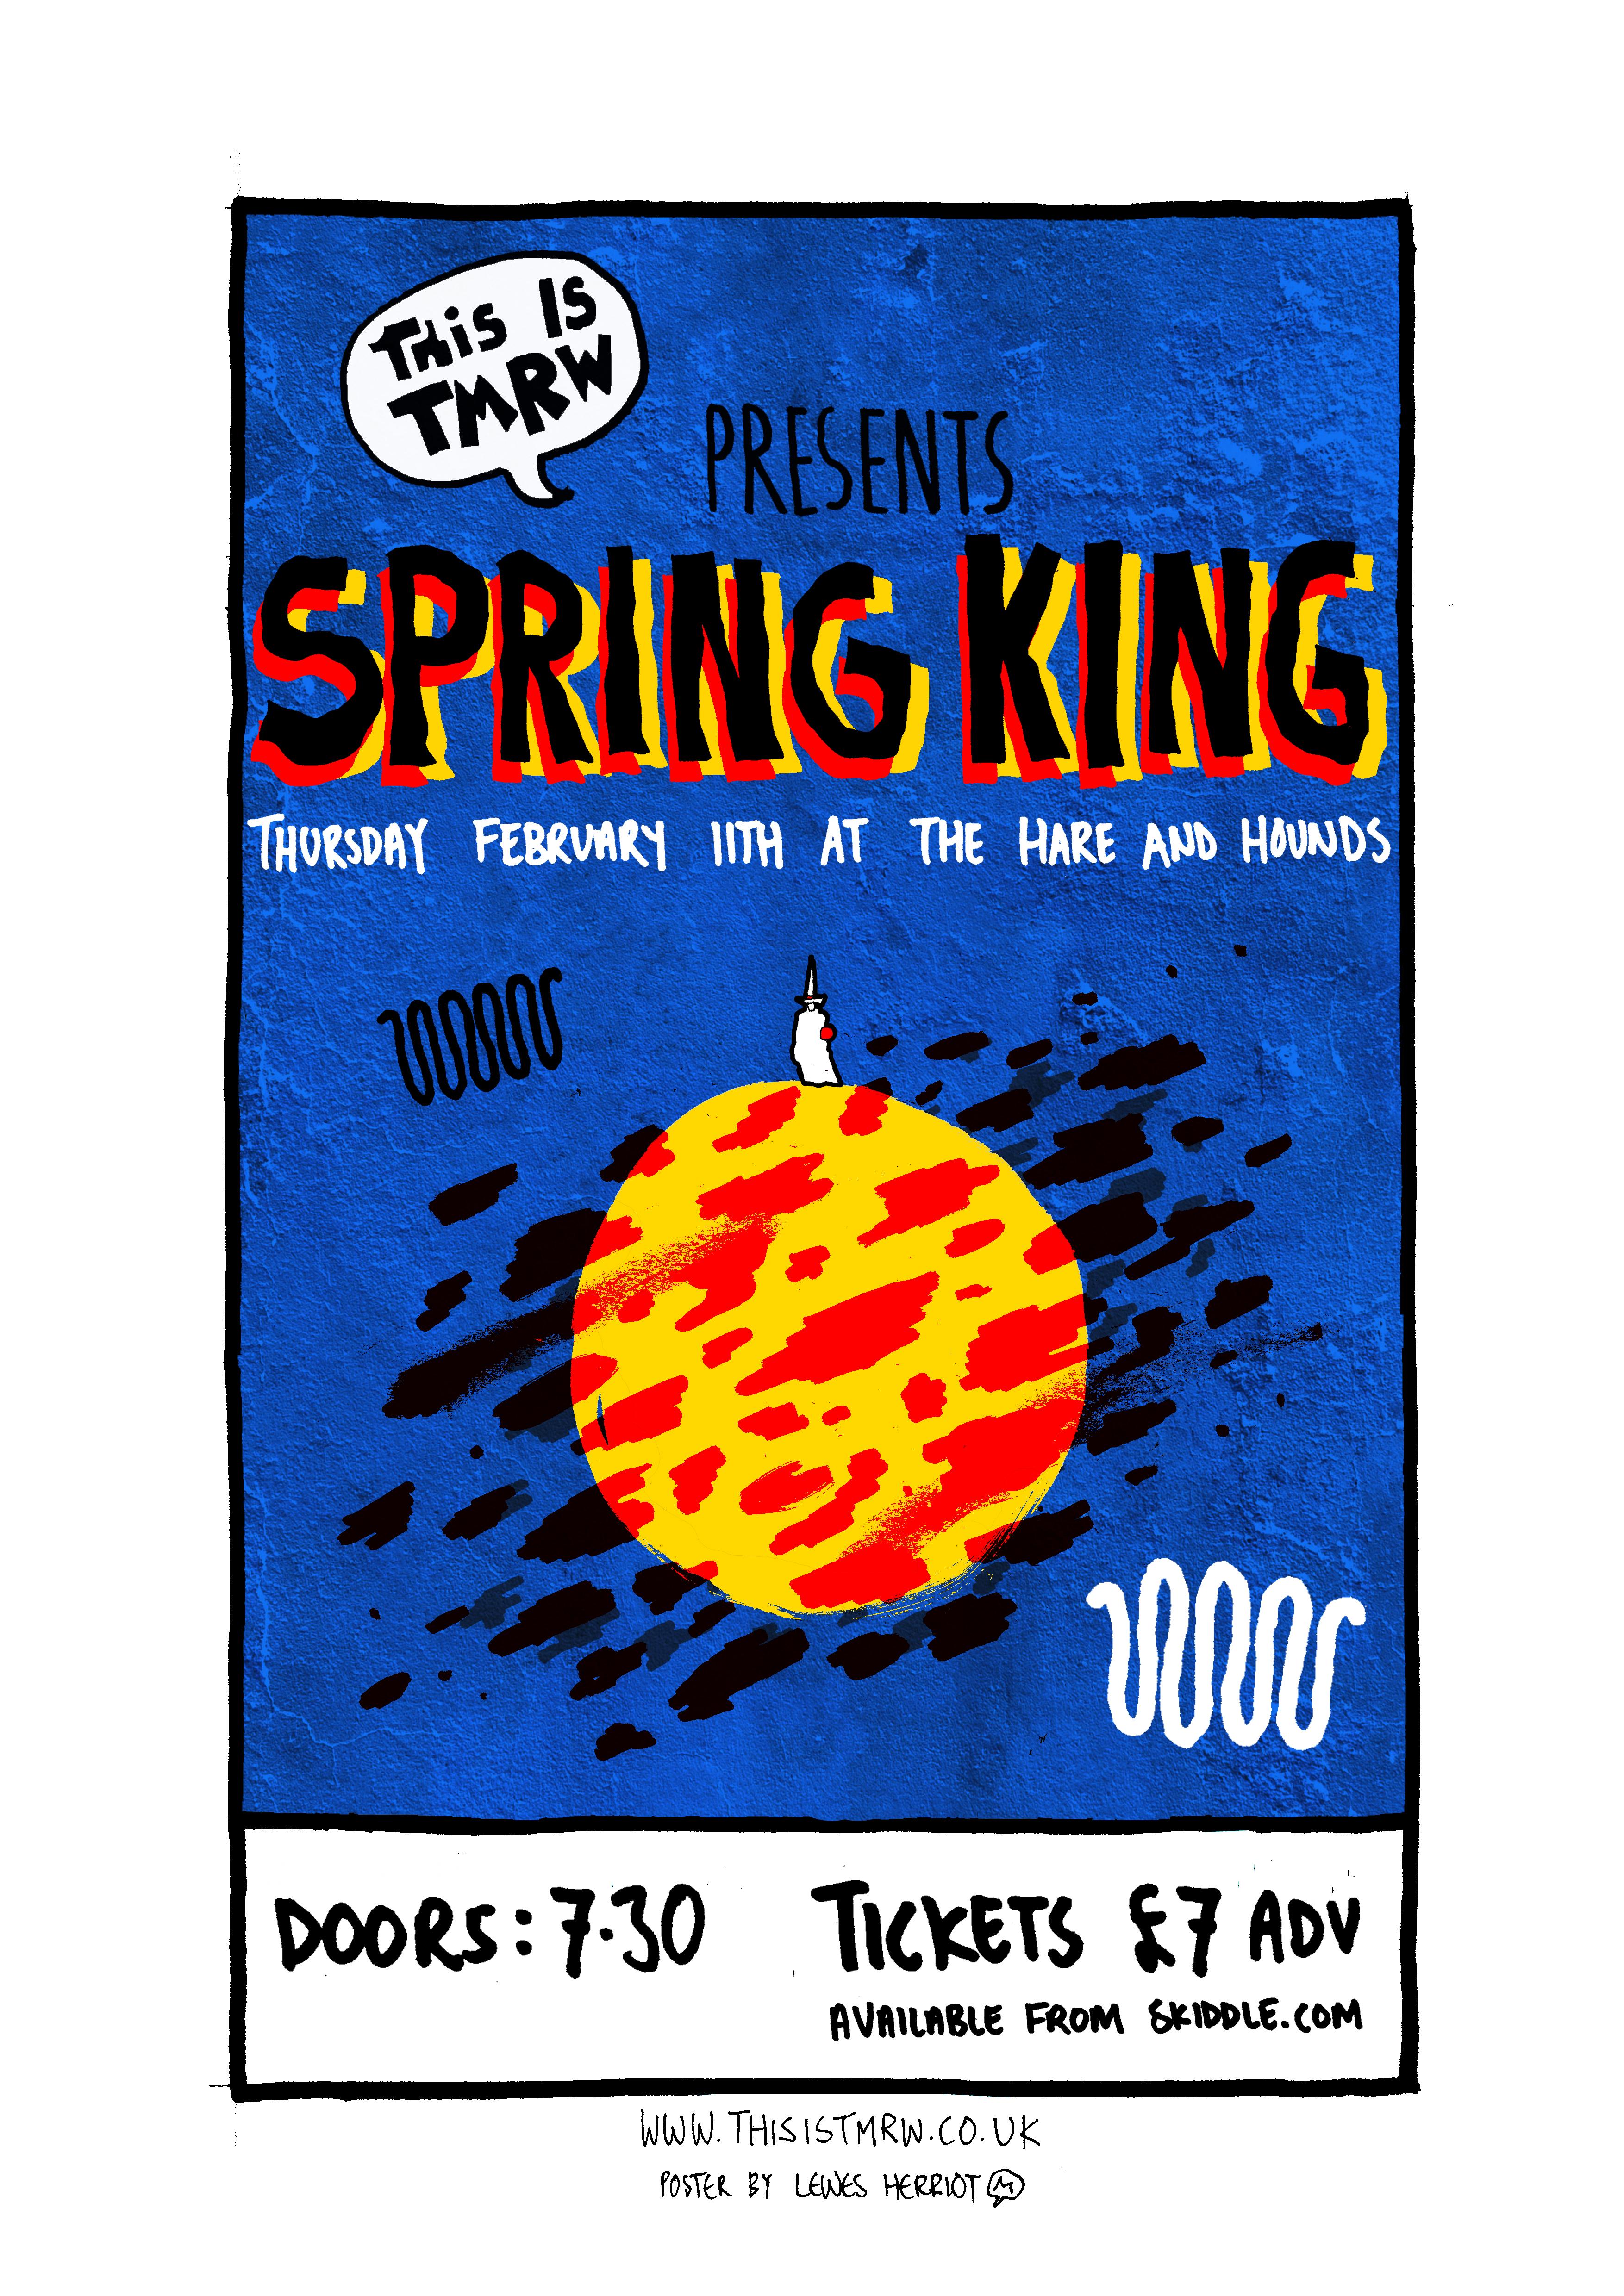 spring king finished 730